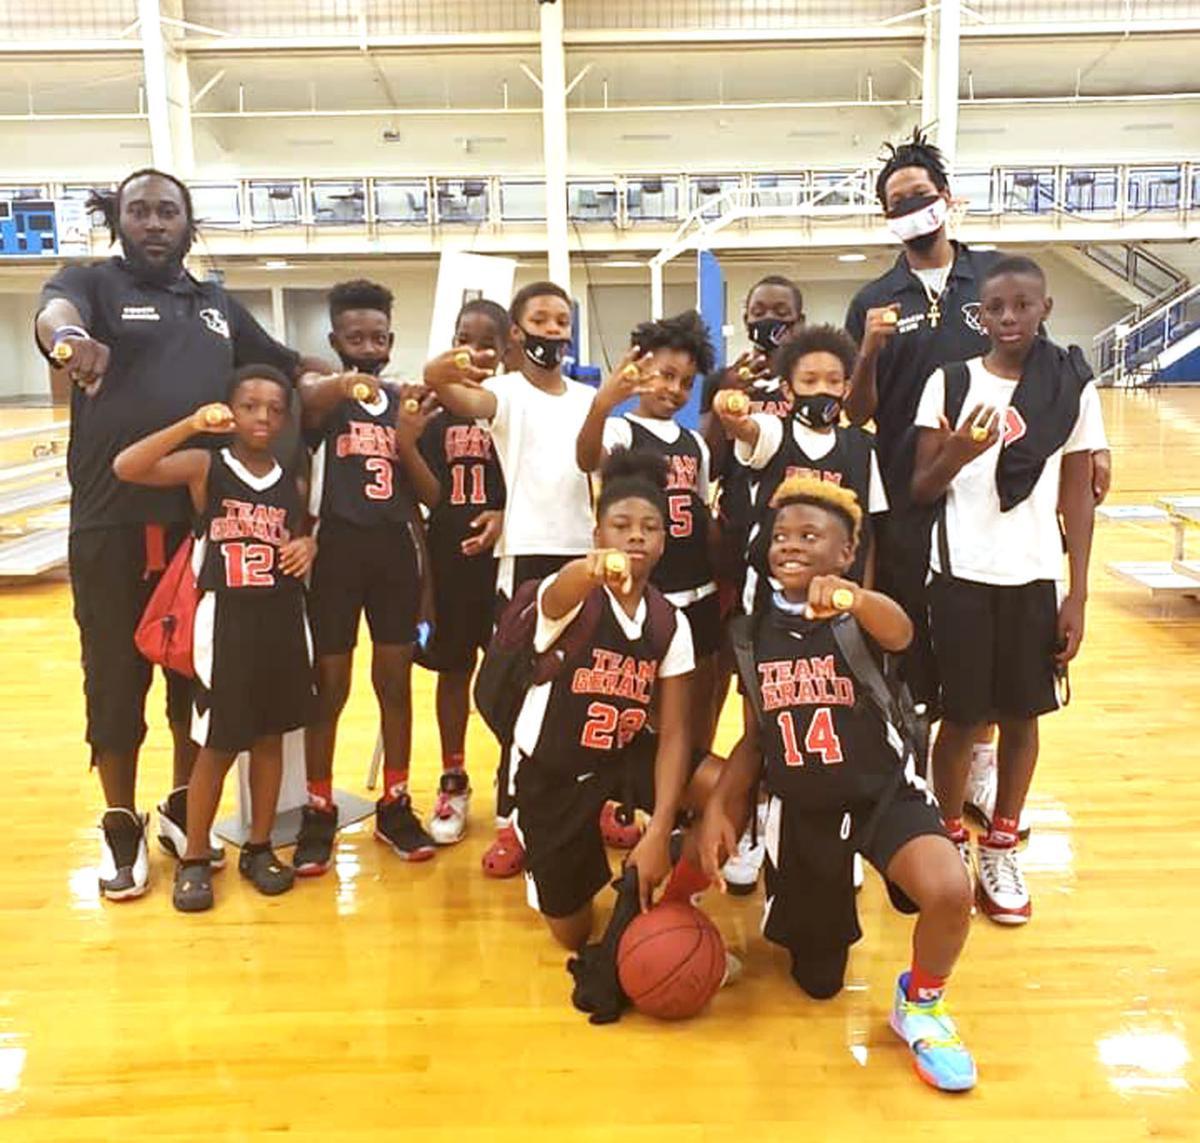 Team Gerald Elite wins national travel ball tournament